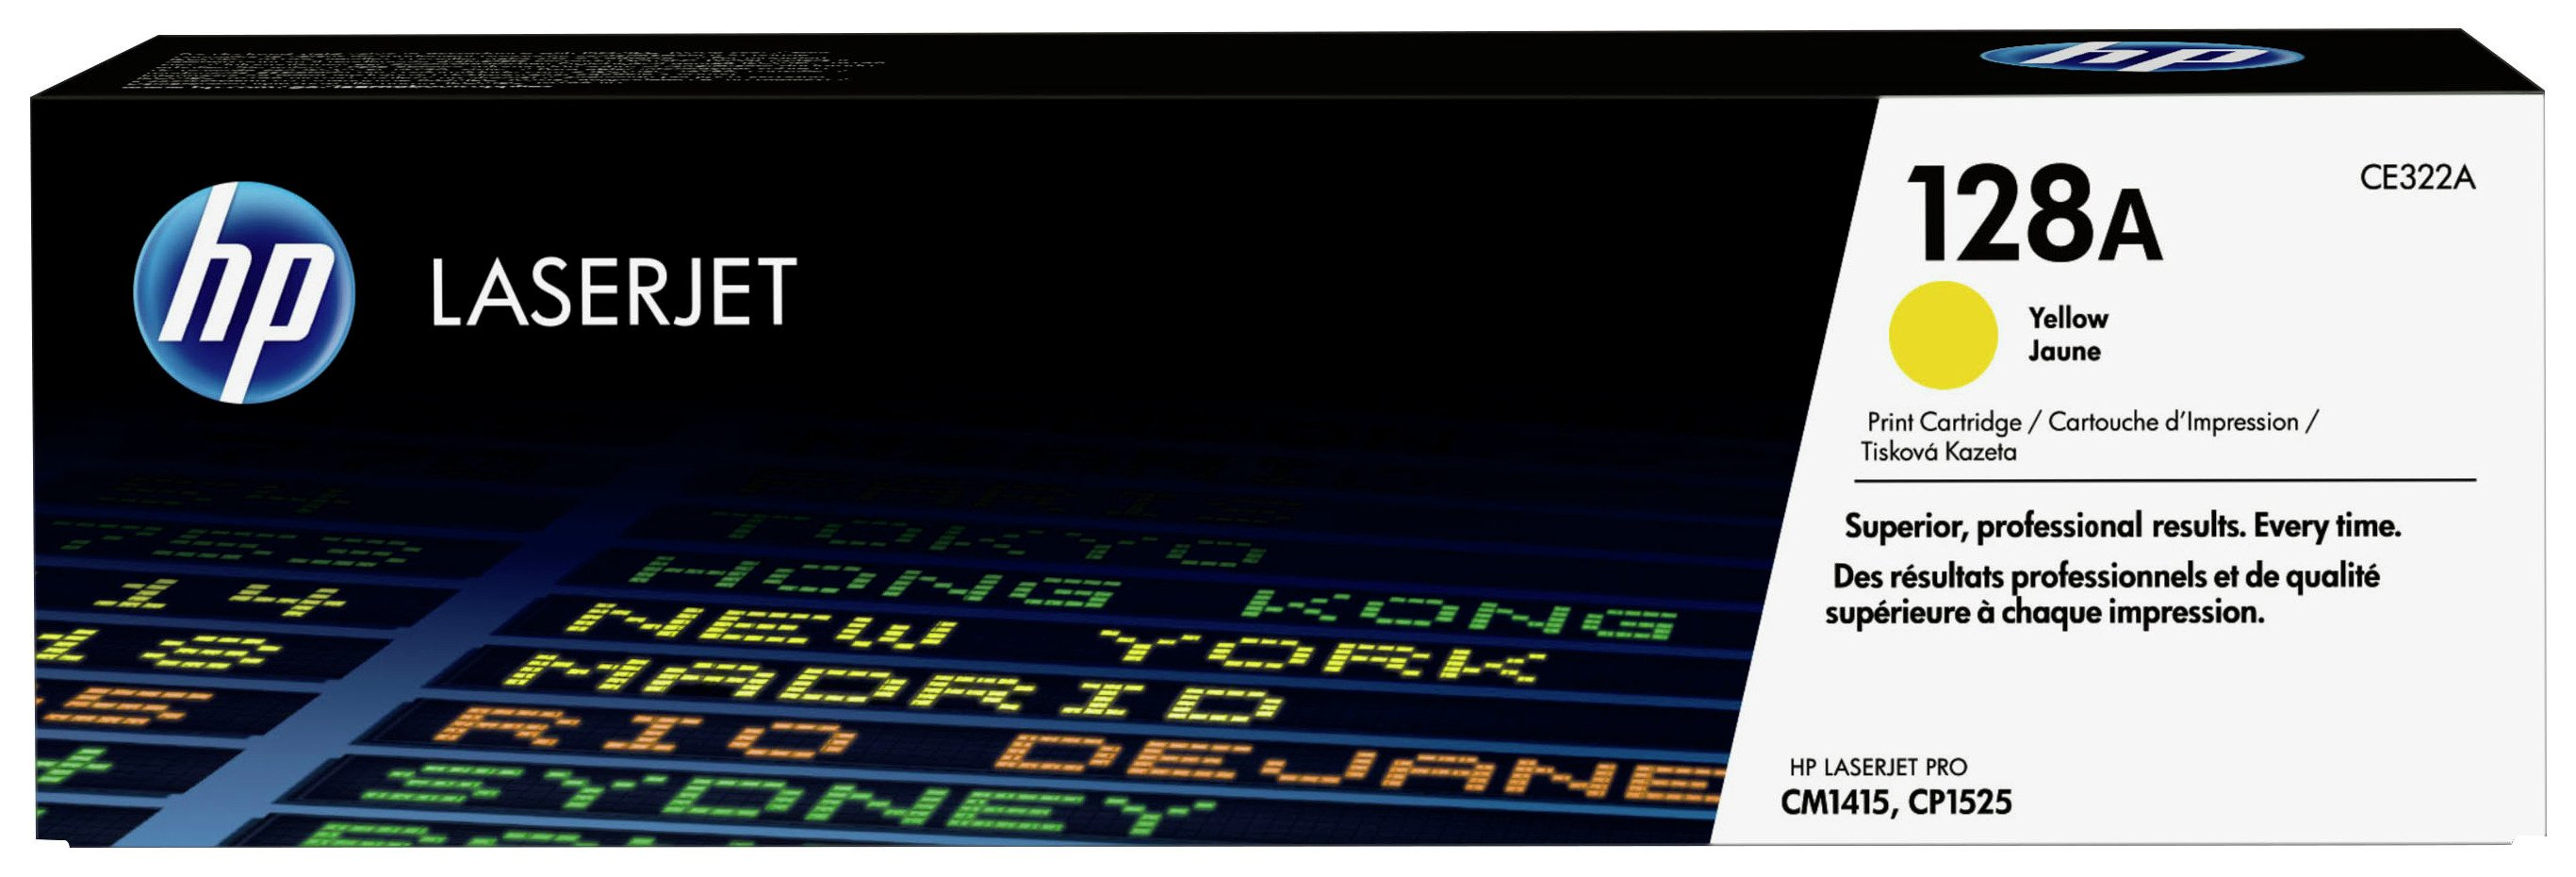 HP - 128A Yellow LaserJet - Toner Cartridge (CE322A)